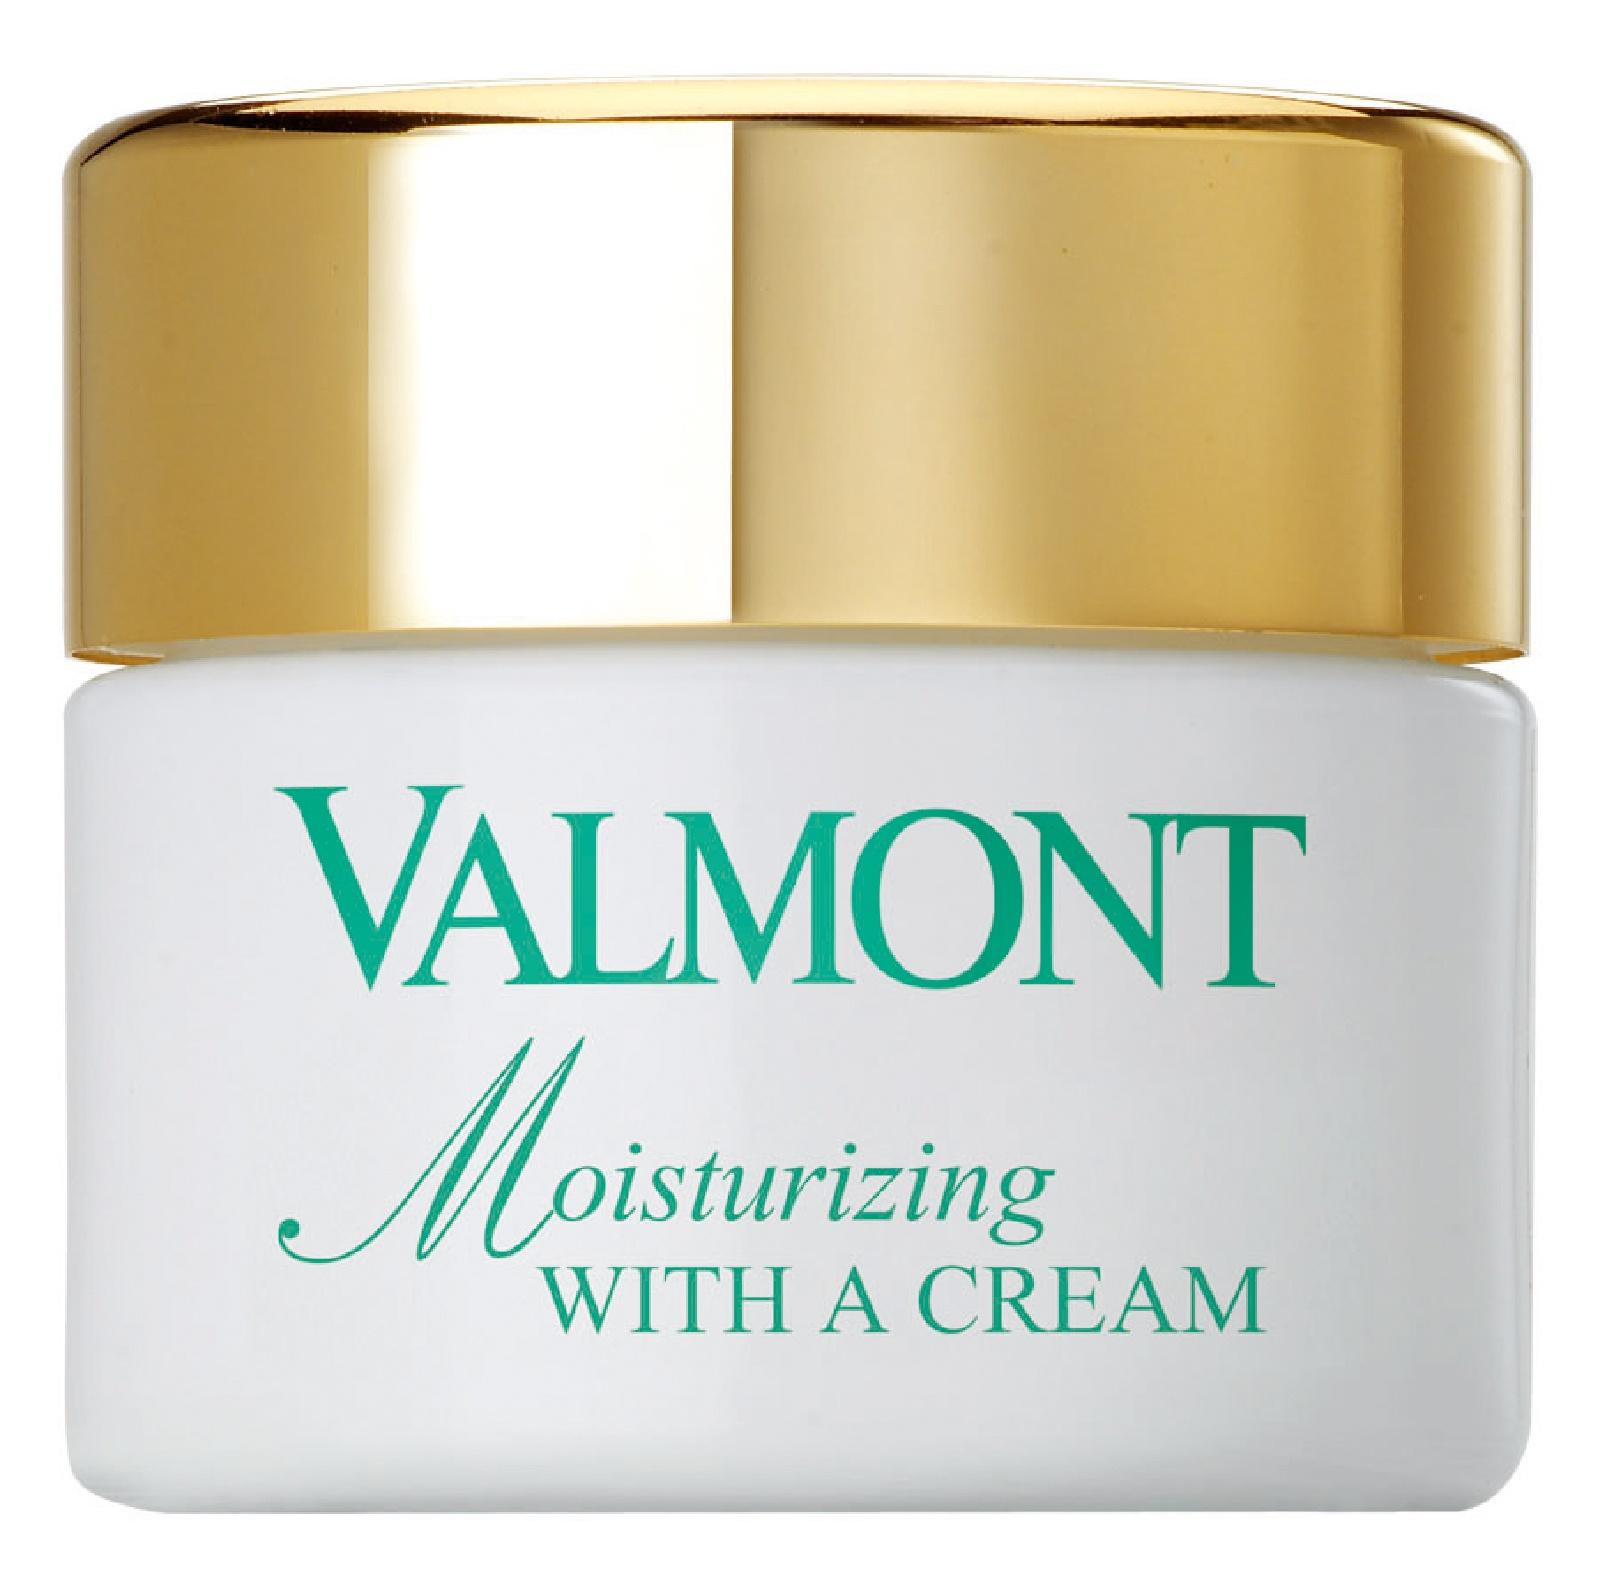 Valmont Moisturising With A Cream